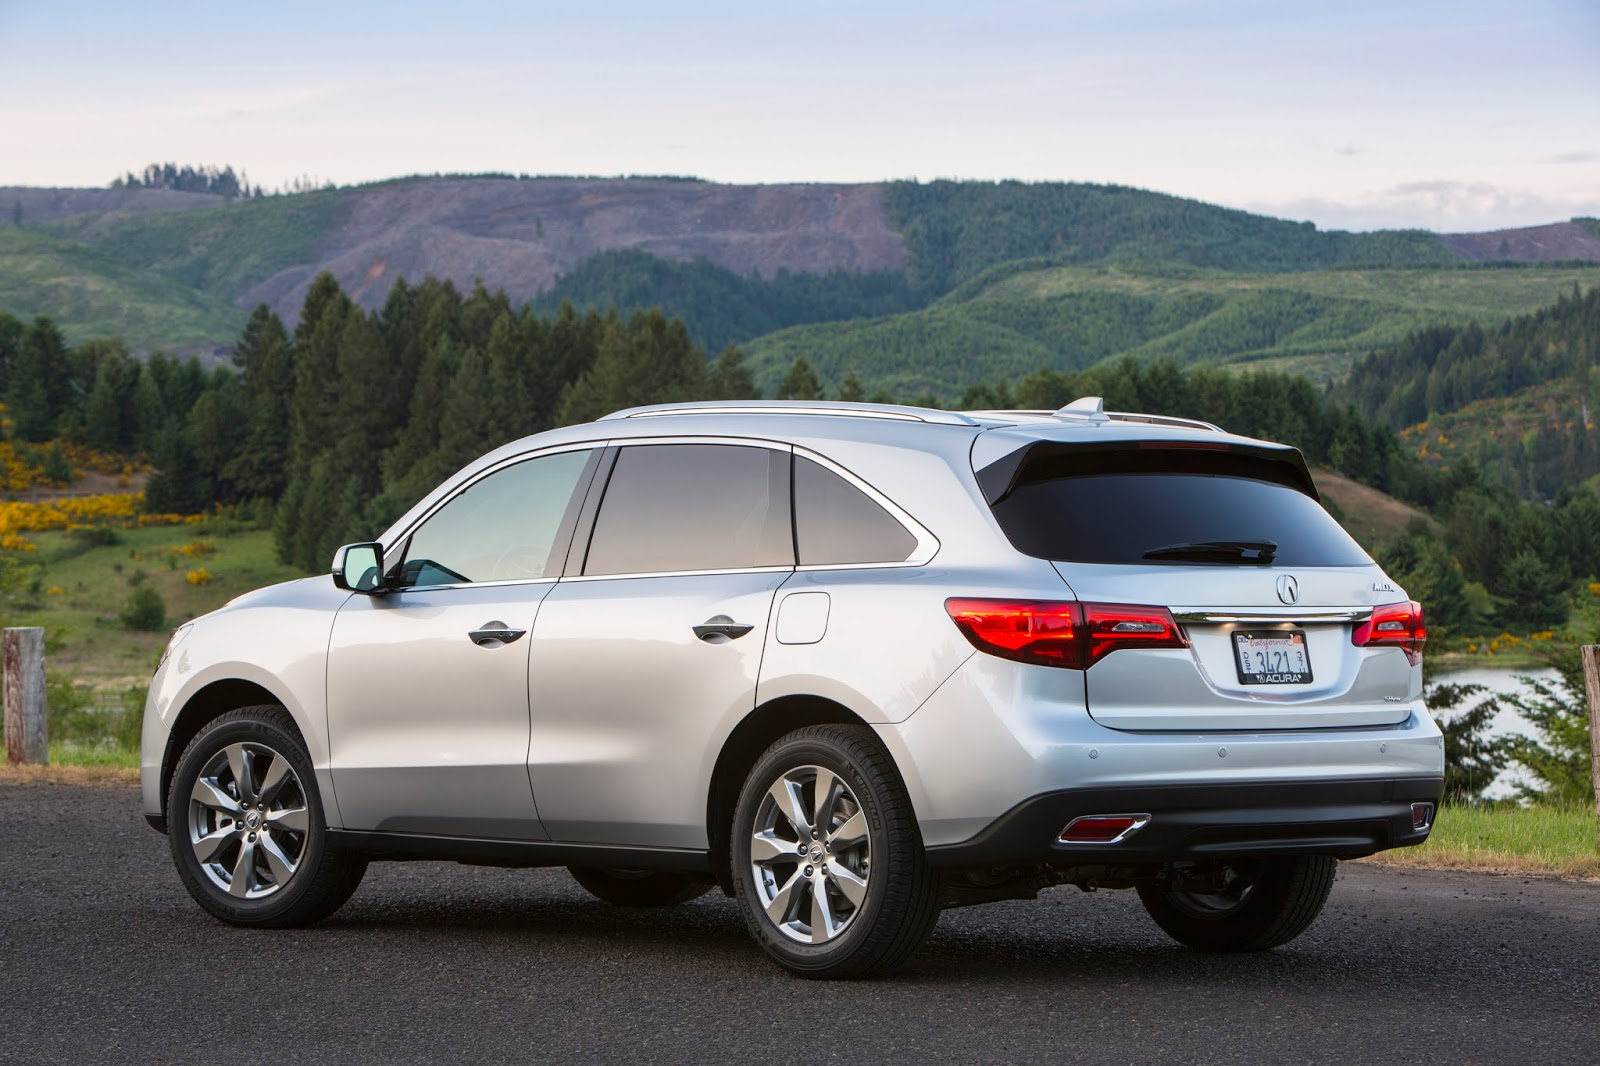 Pioneer Wagon: The 2016 Acura MDX